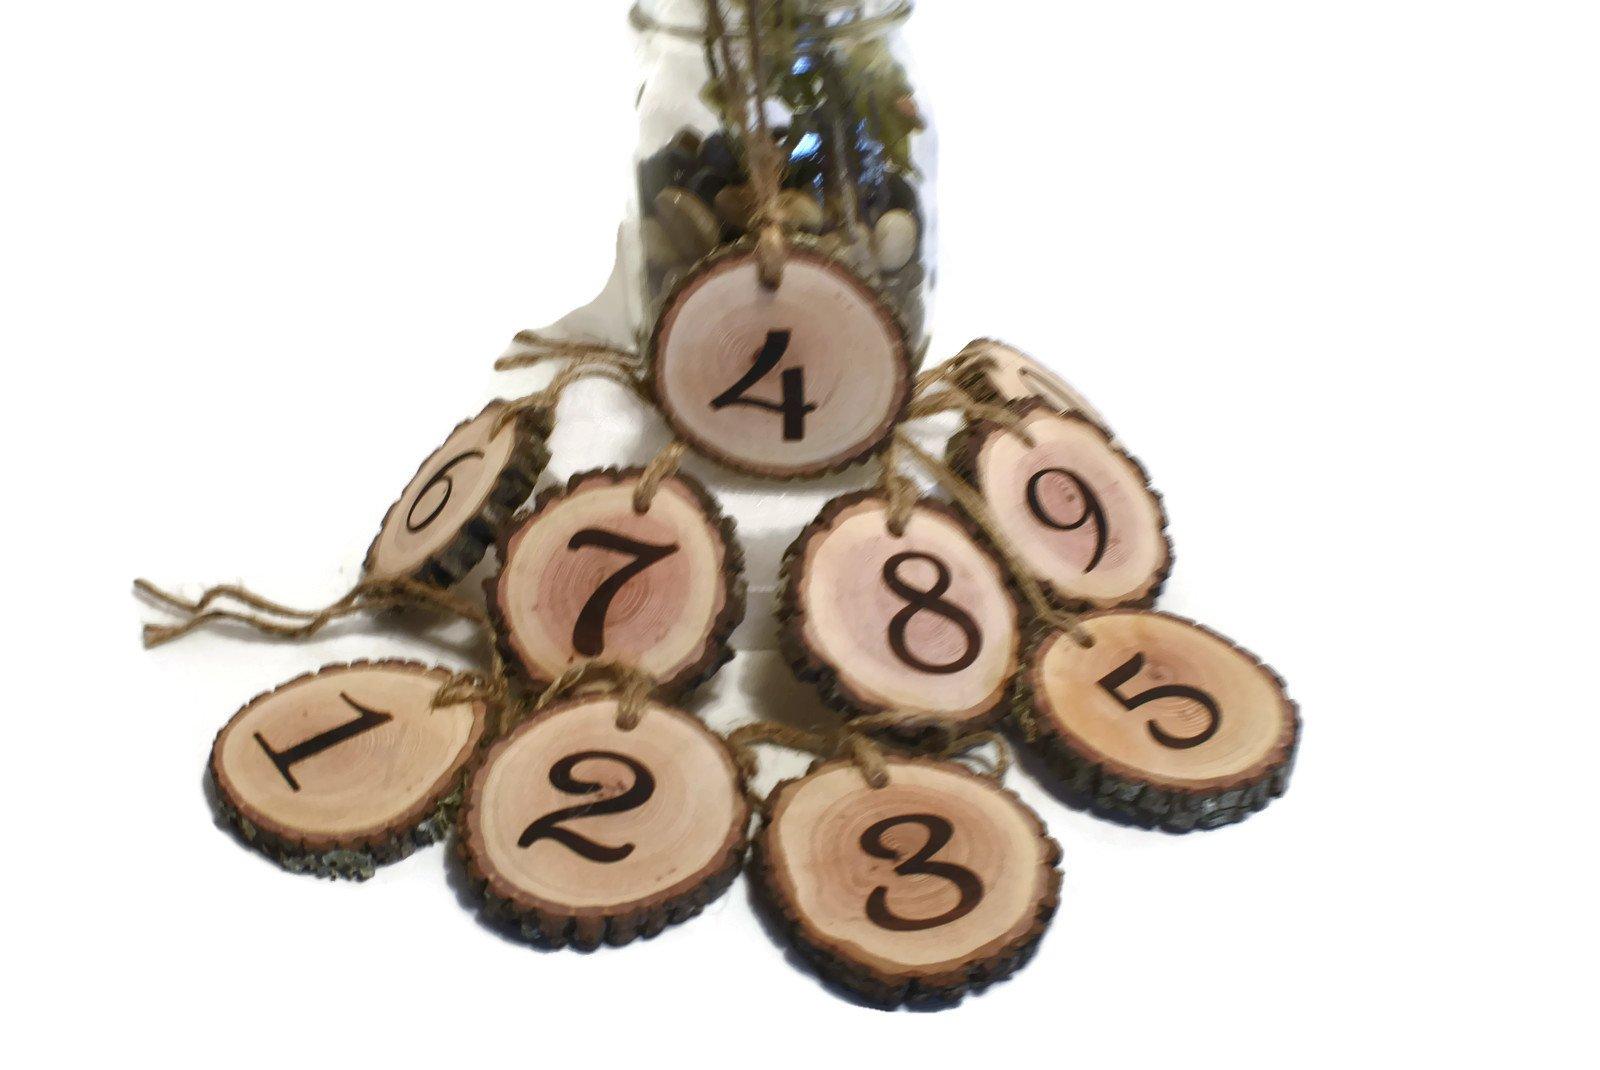 Rustic Wedding Hanging Table Numbers Wood slice, Event Cordinators, Corporate parties, Graduations, Birthdays, Basptimal, Bridal shower, Baby shower (20)